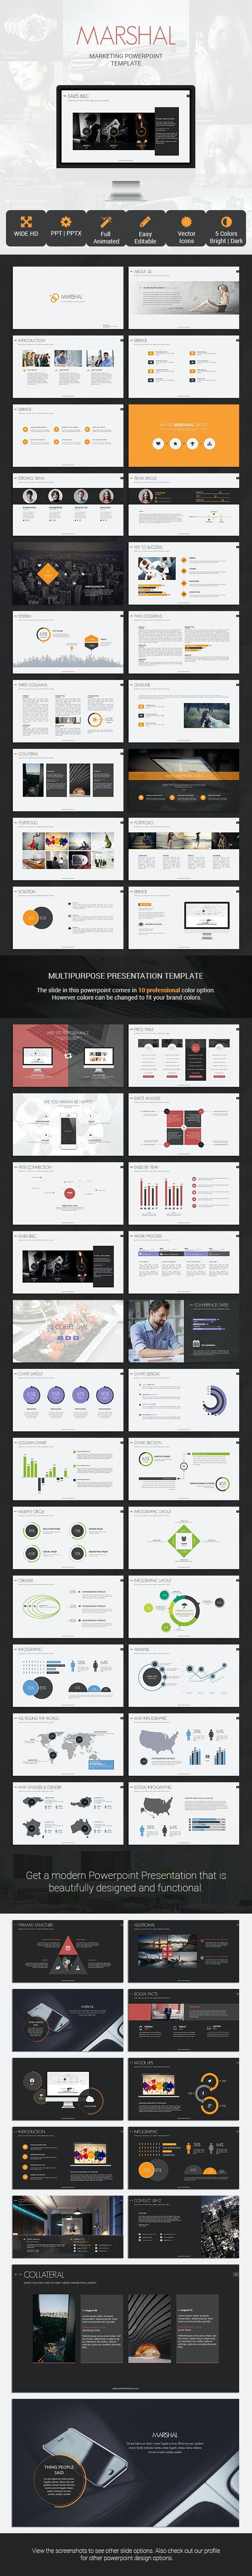 Marshal Marketing Presentation Template - PowerPoint Templates Presentation Templates